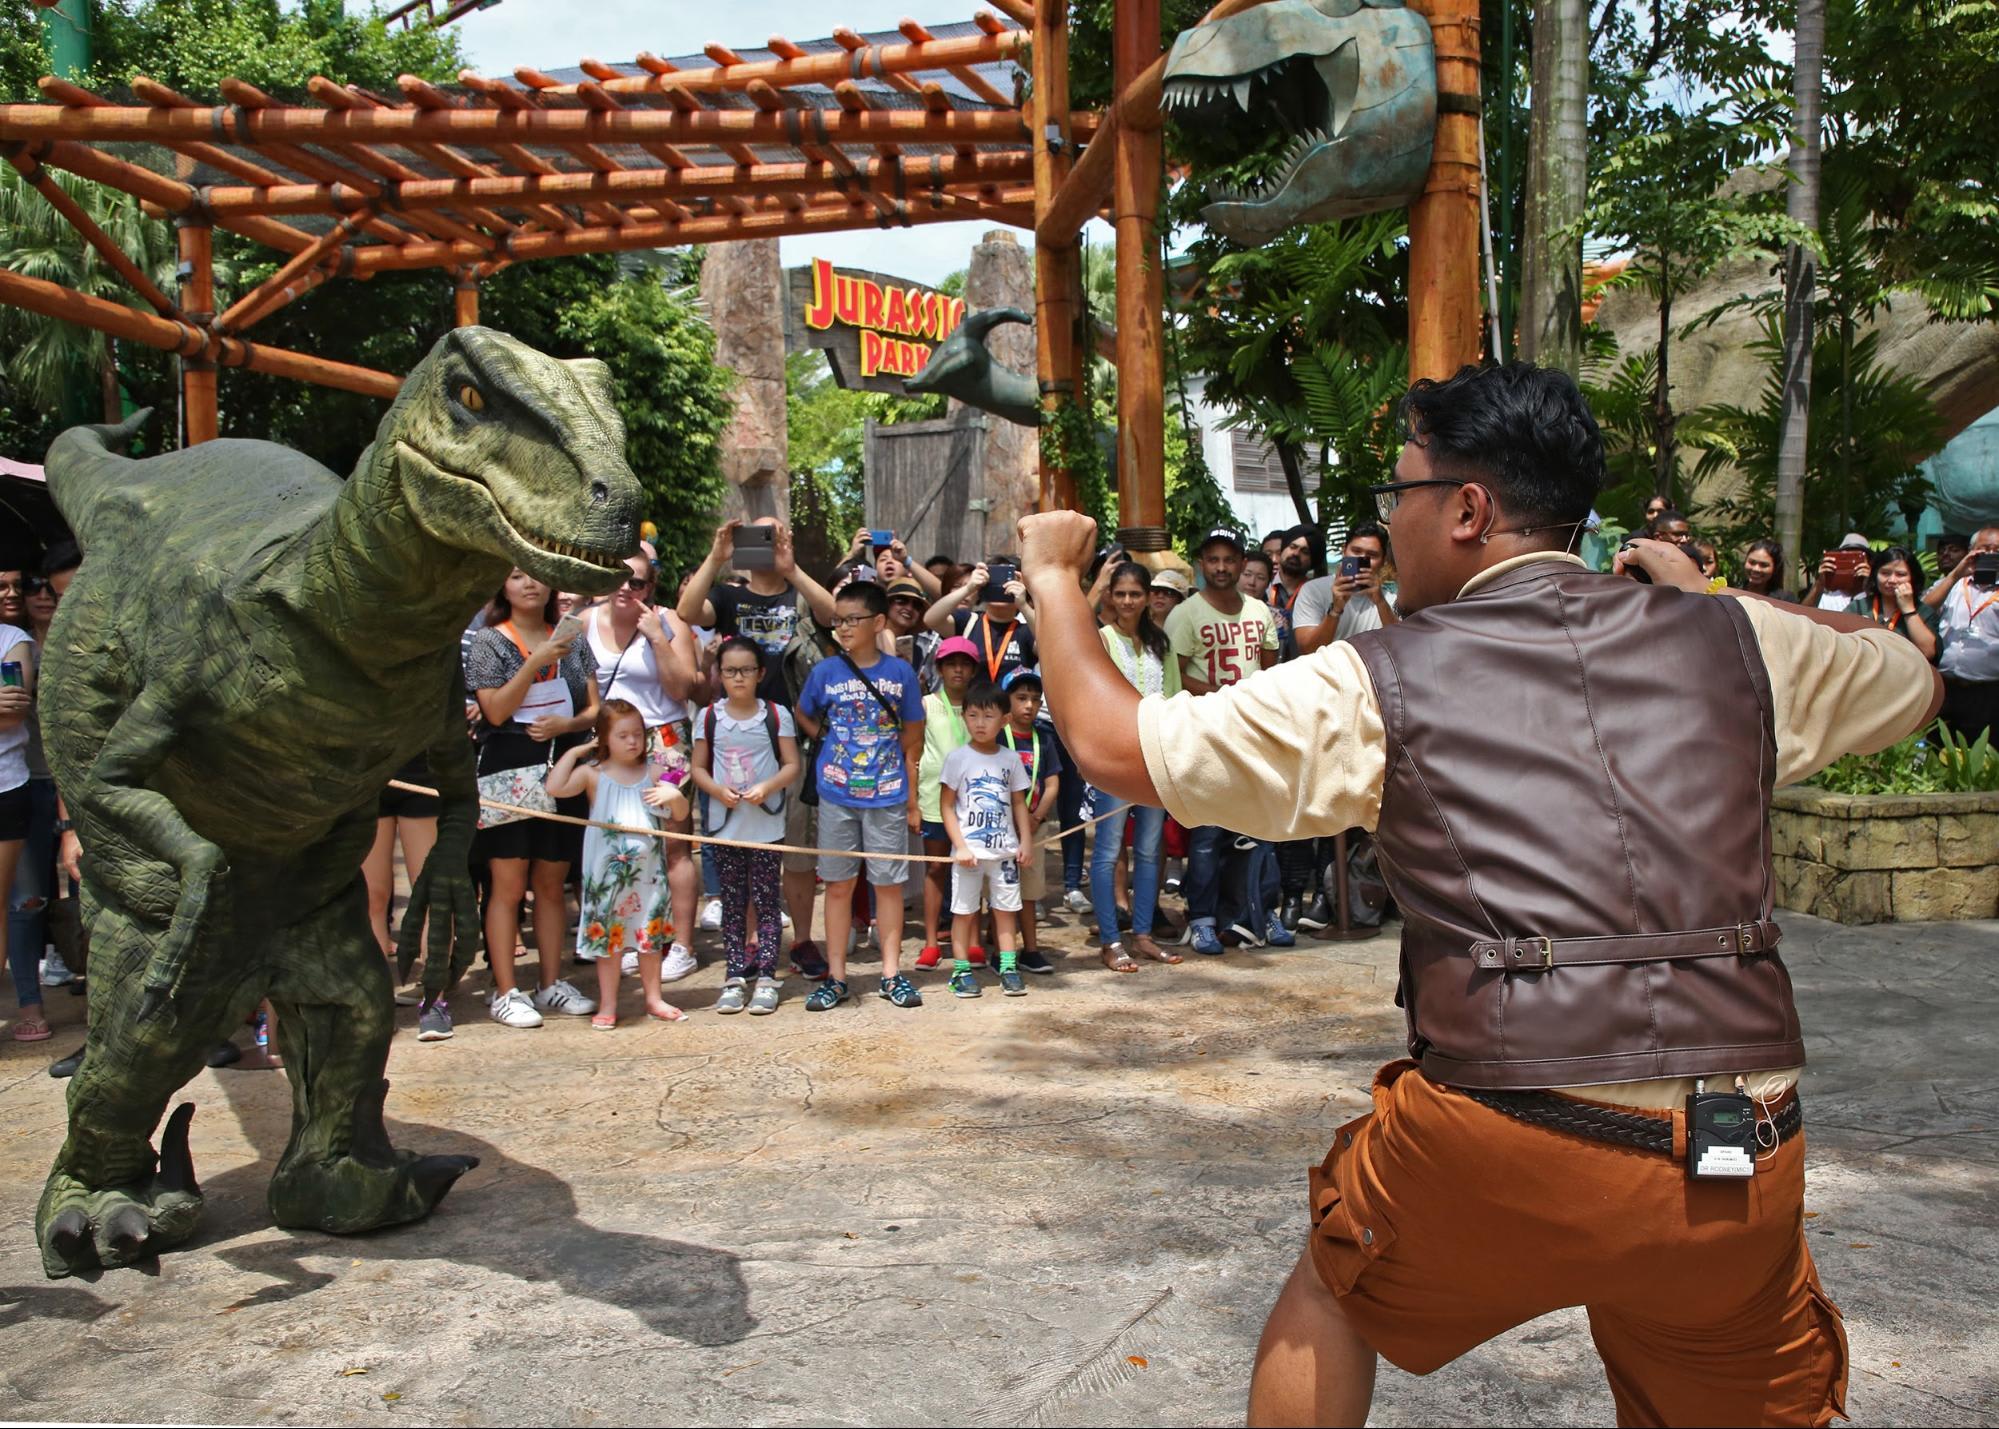 Jurassic World Dinosaur Trainer Universal Studios Singapore